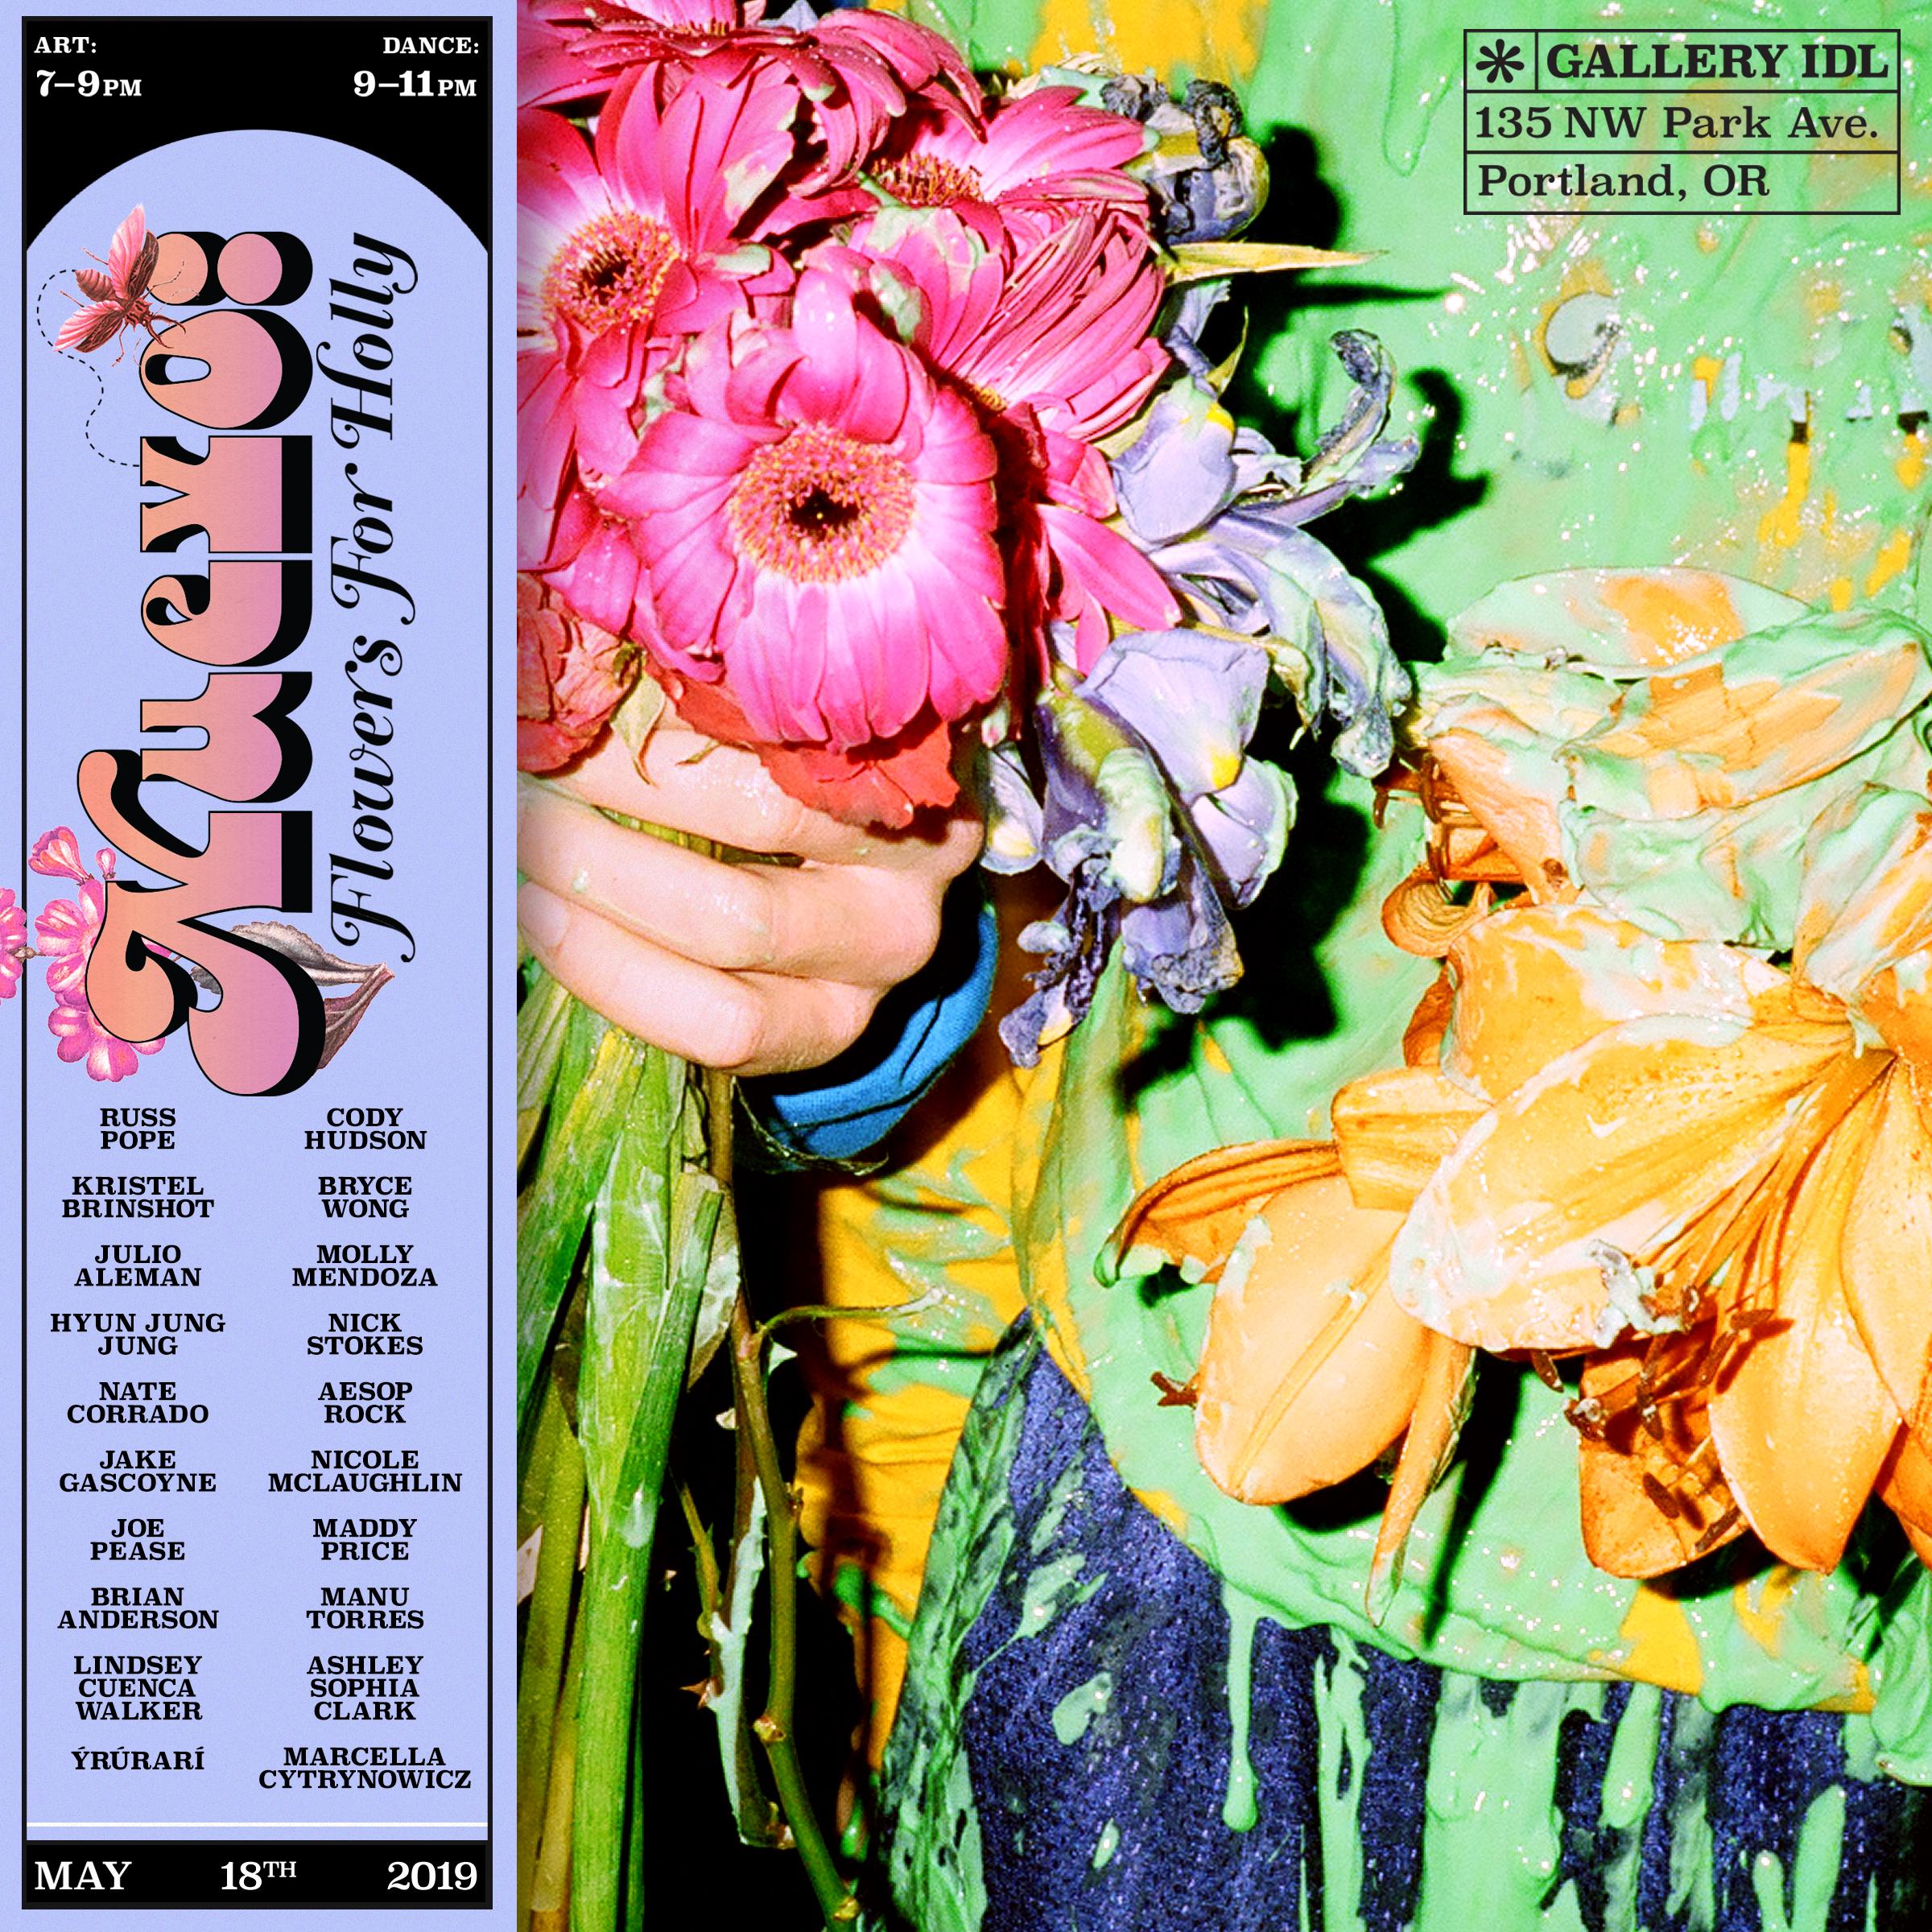 Nuevo_FfH_Album_Artists_5.4.jpg